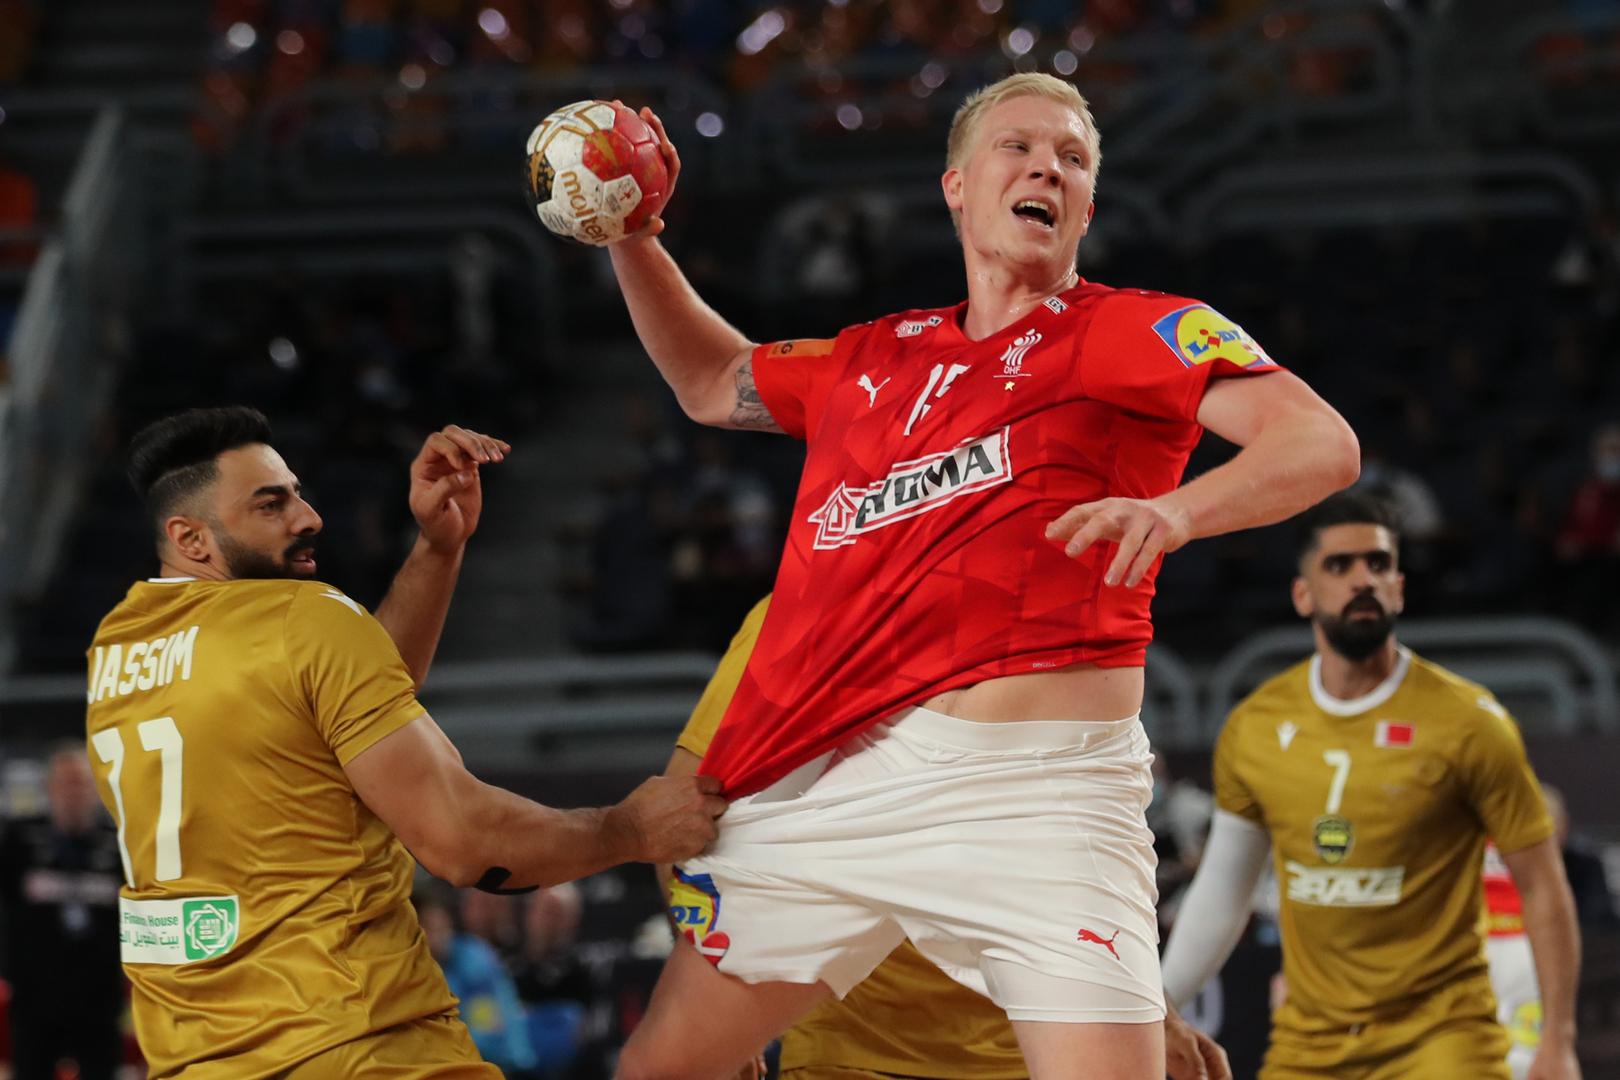 Corona's first case in the Handball World Cup